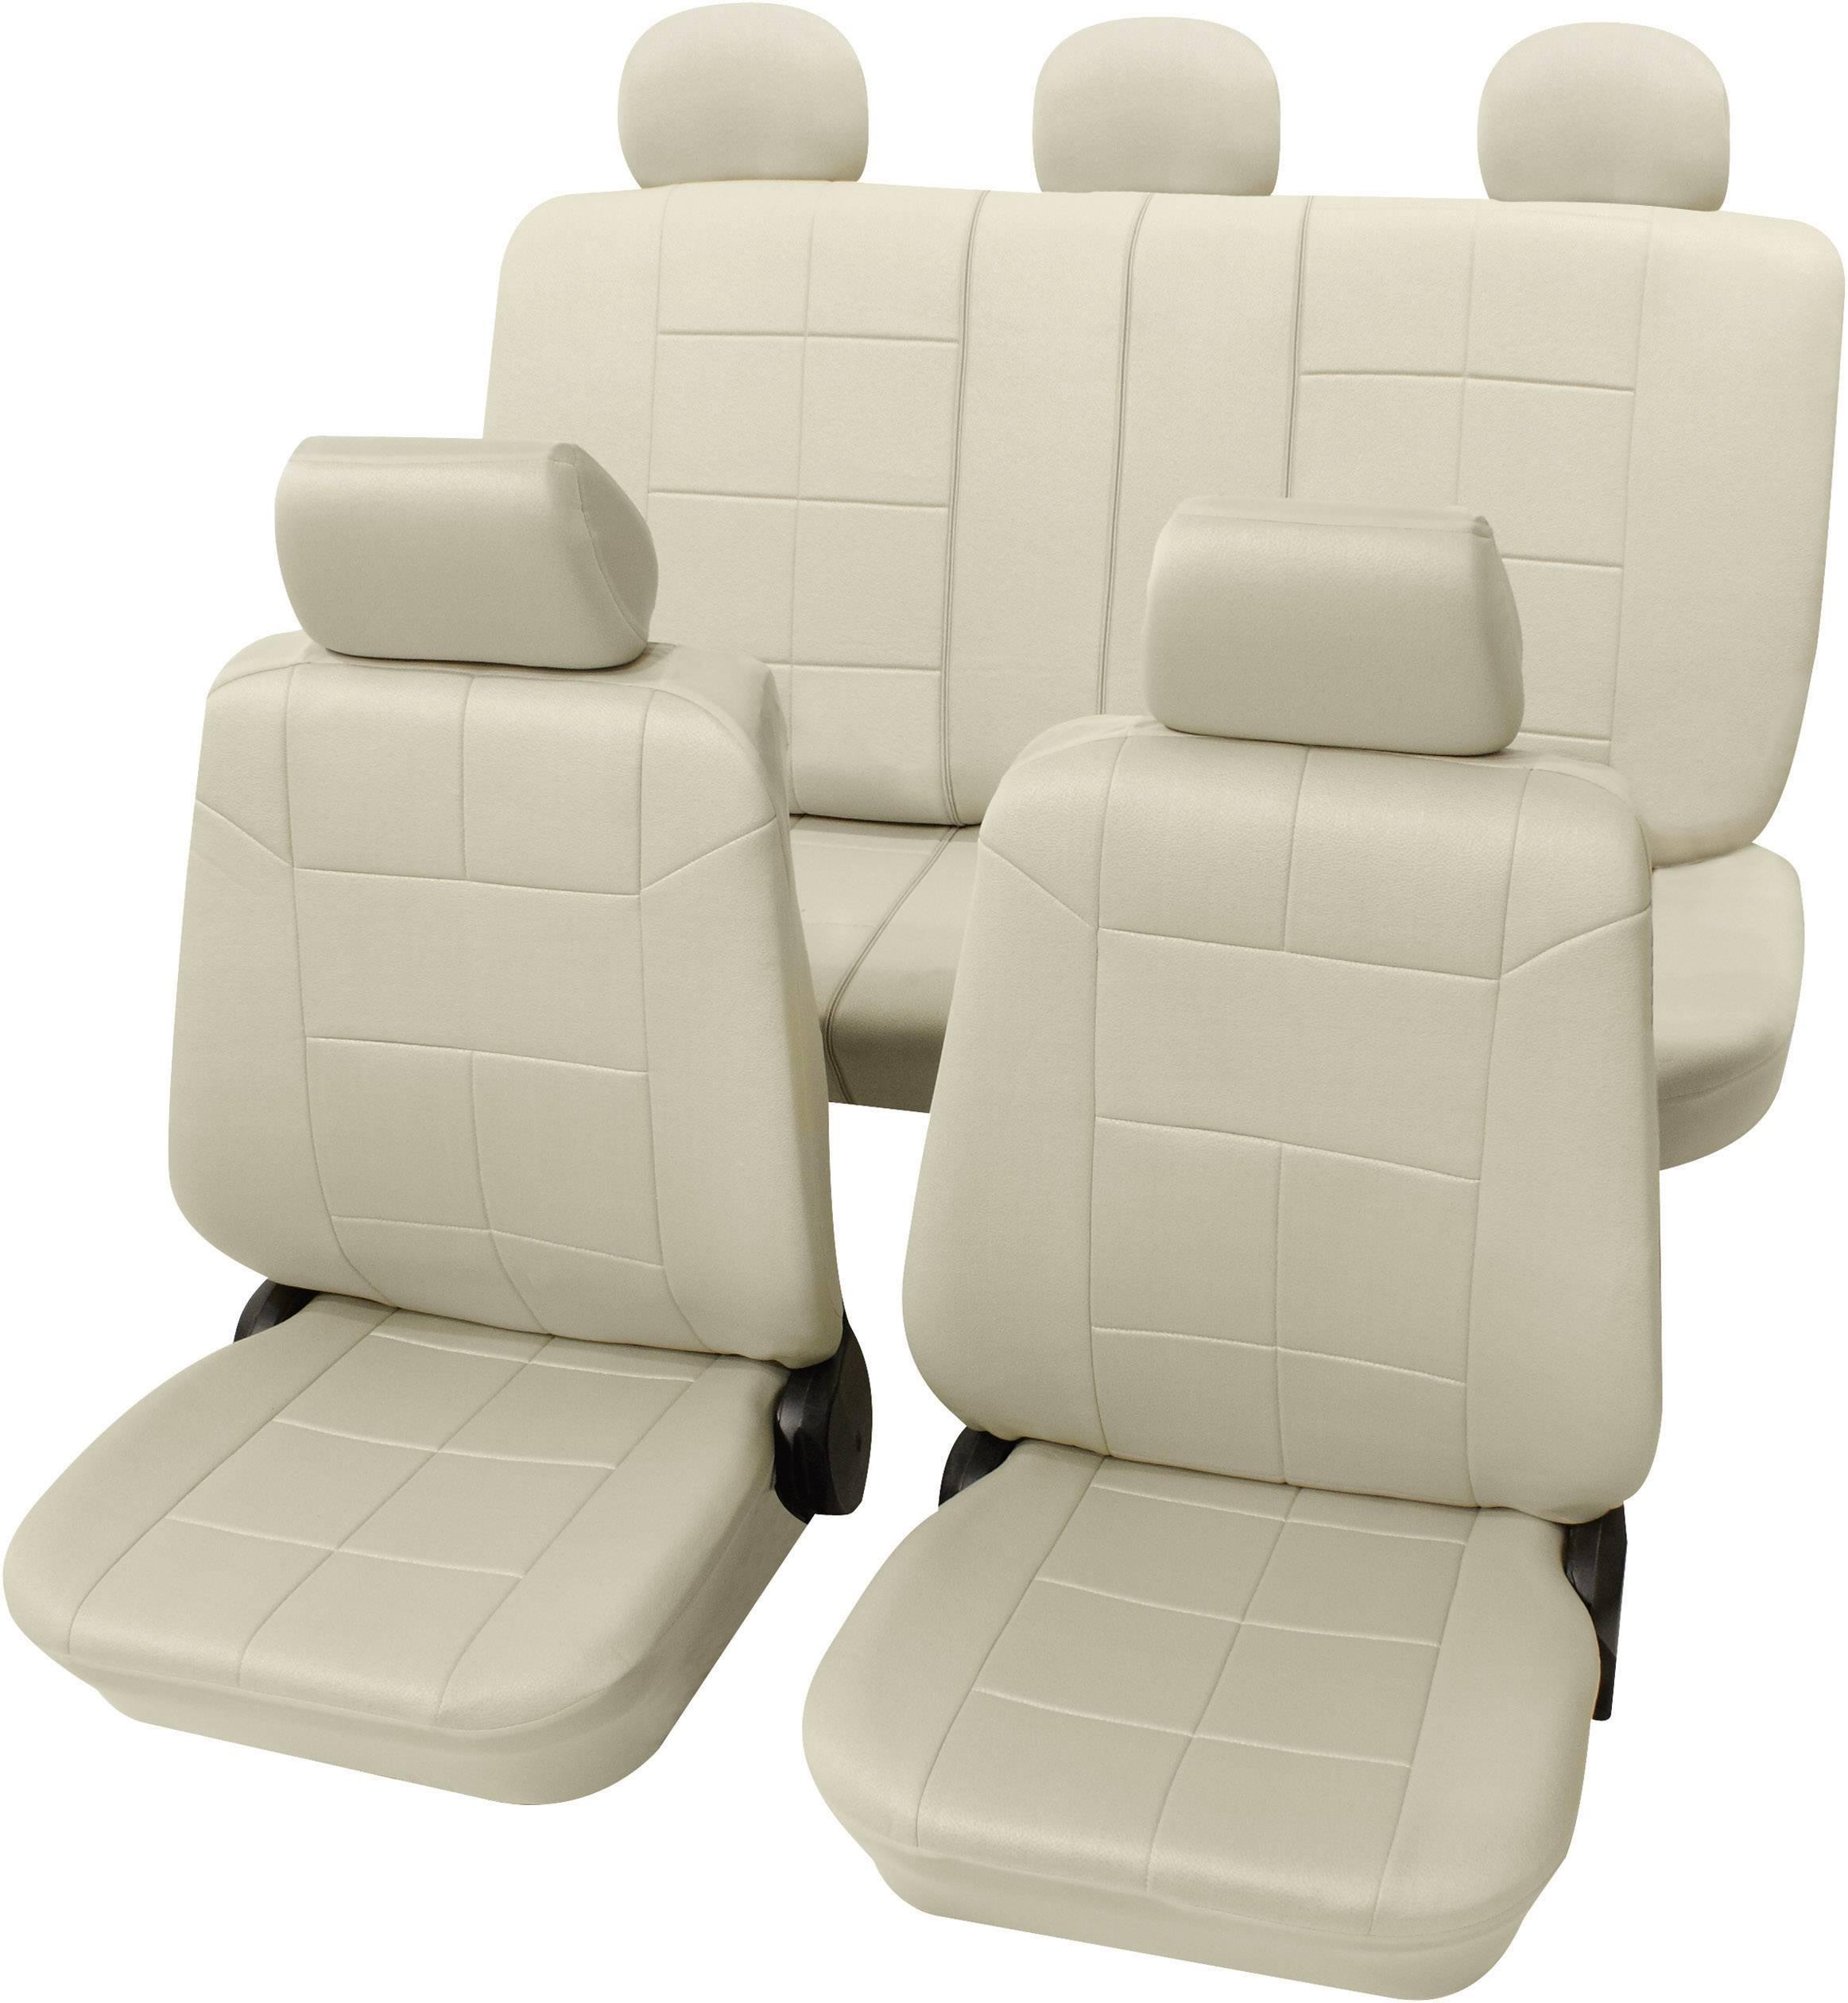 Autopoťahy Petex Dakar SAB 1 Vario Plus;22574909, 17-dielna, polyester, béžová